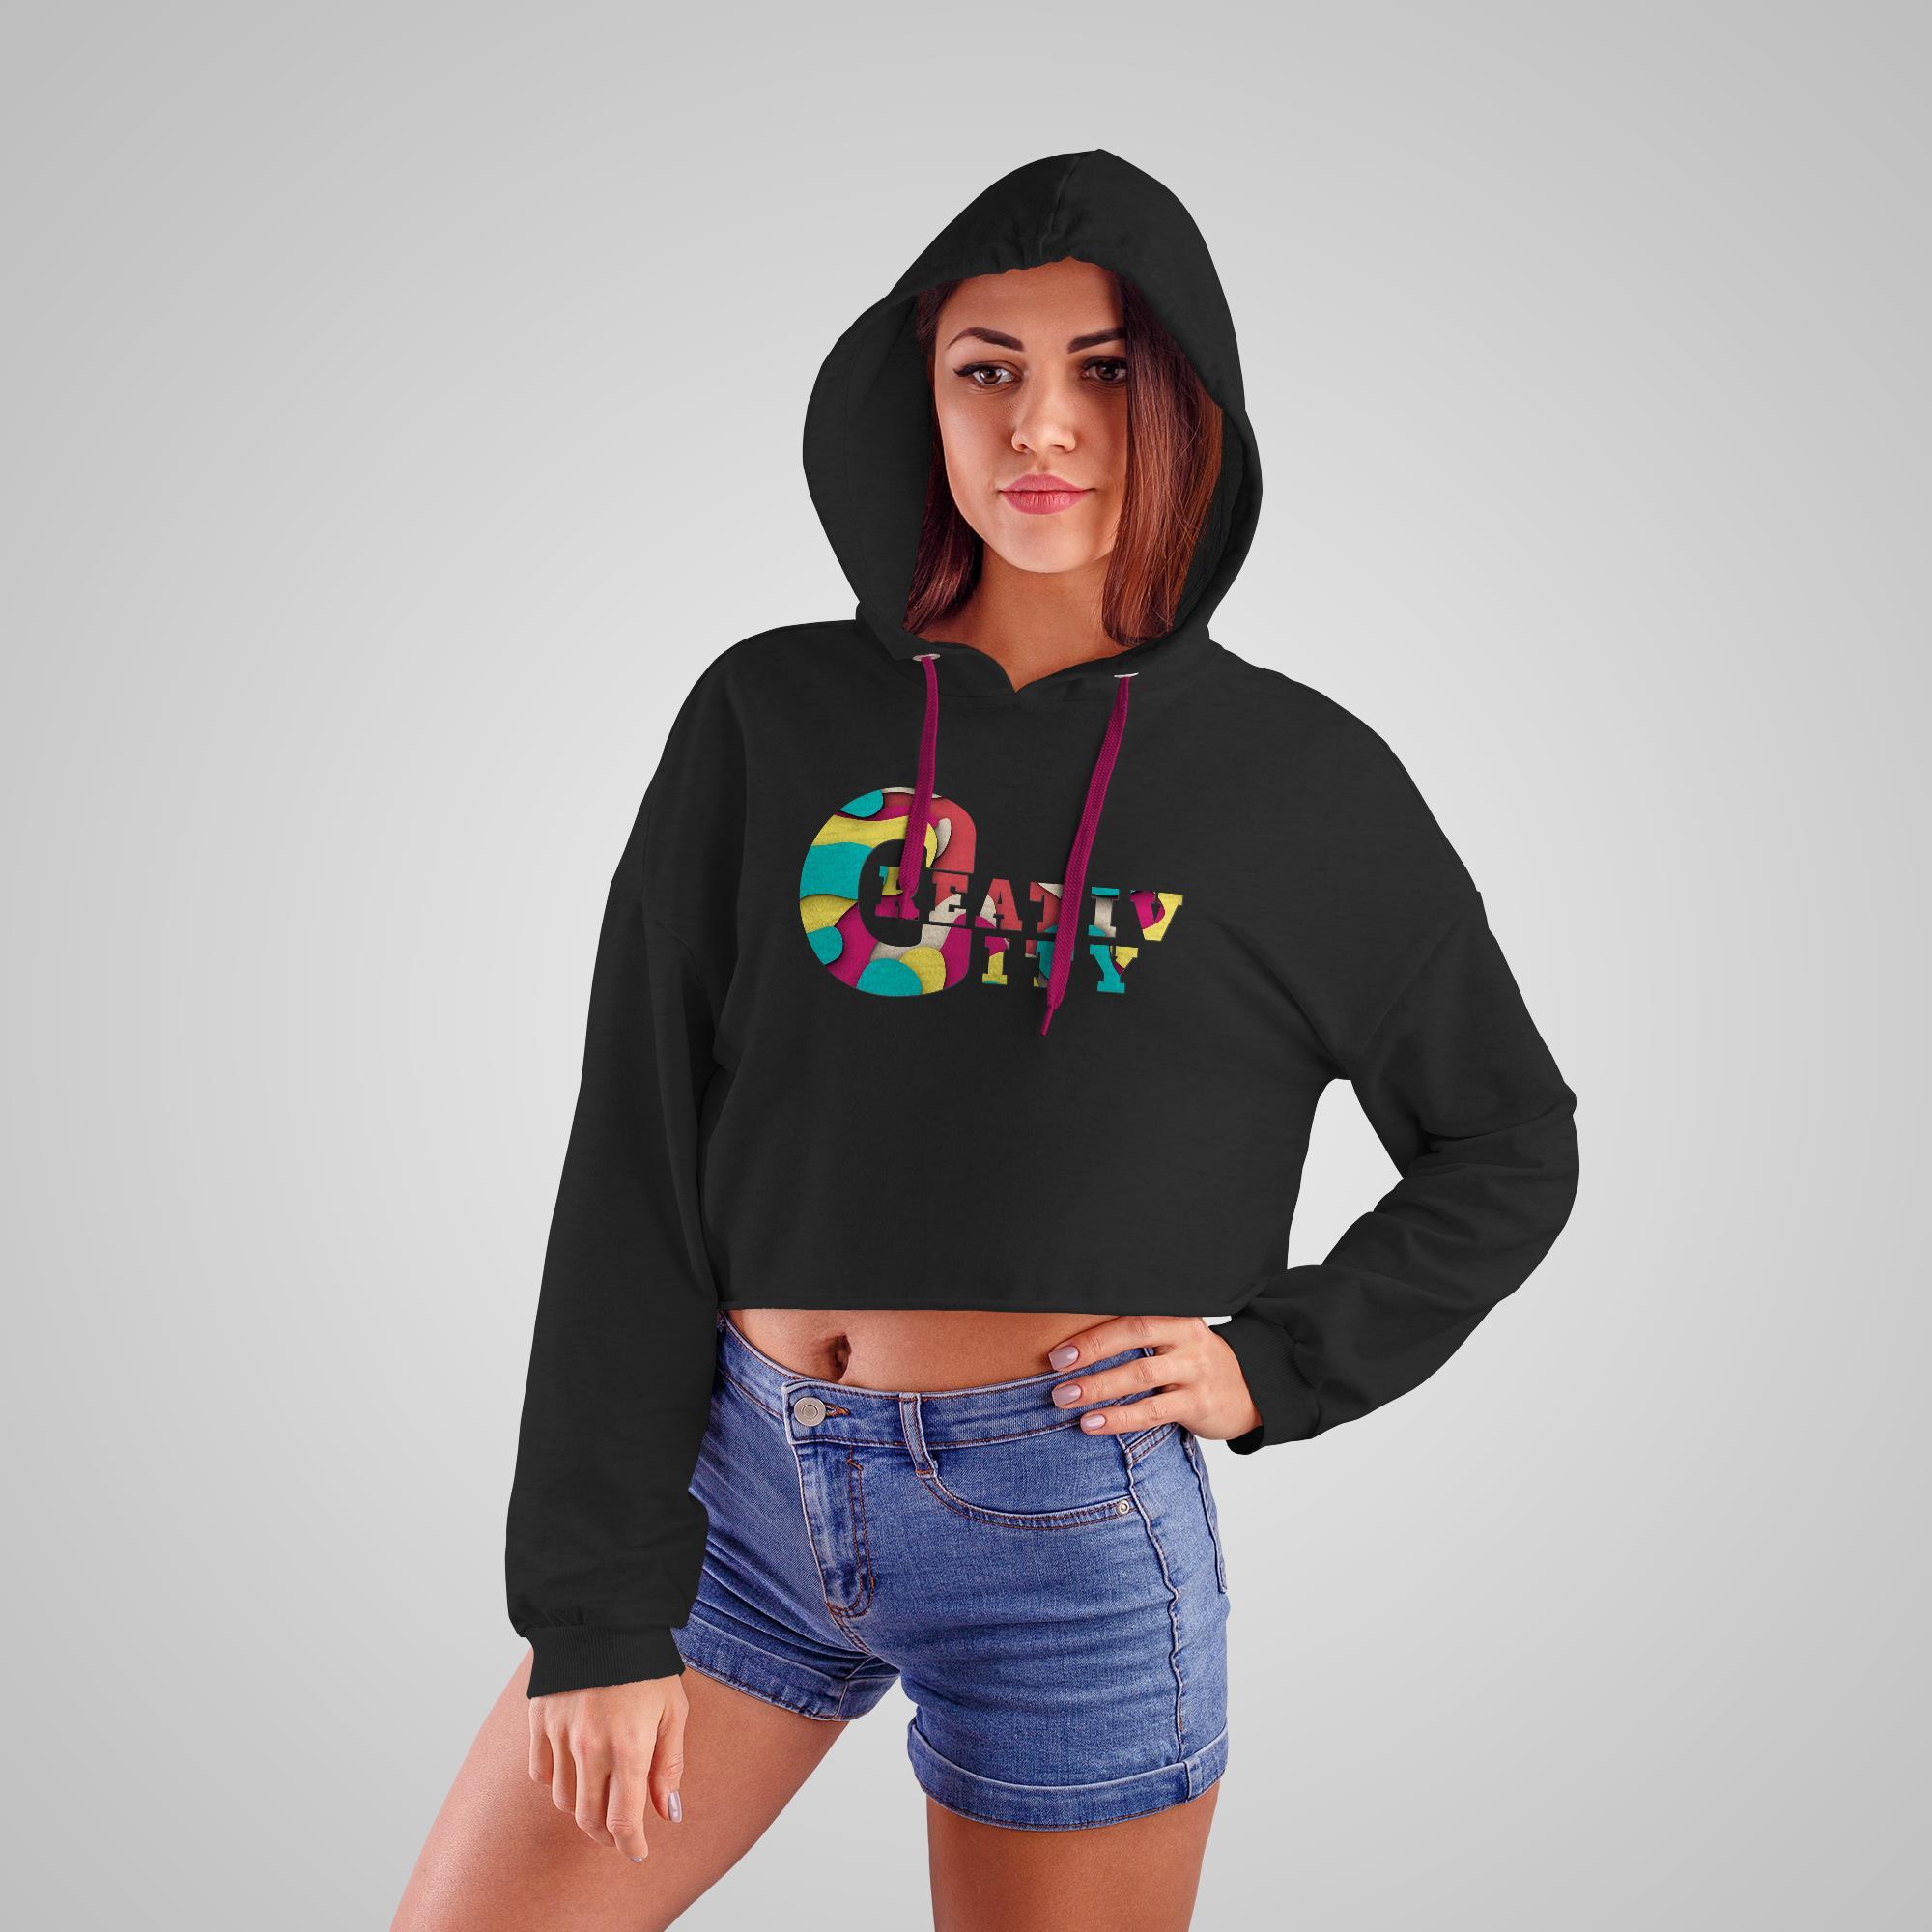 -creativity-hoodie-woman-mockup2000x2000